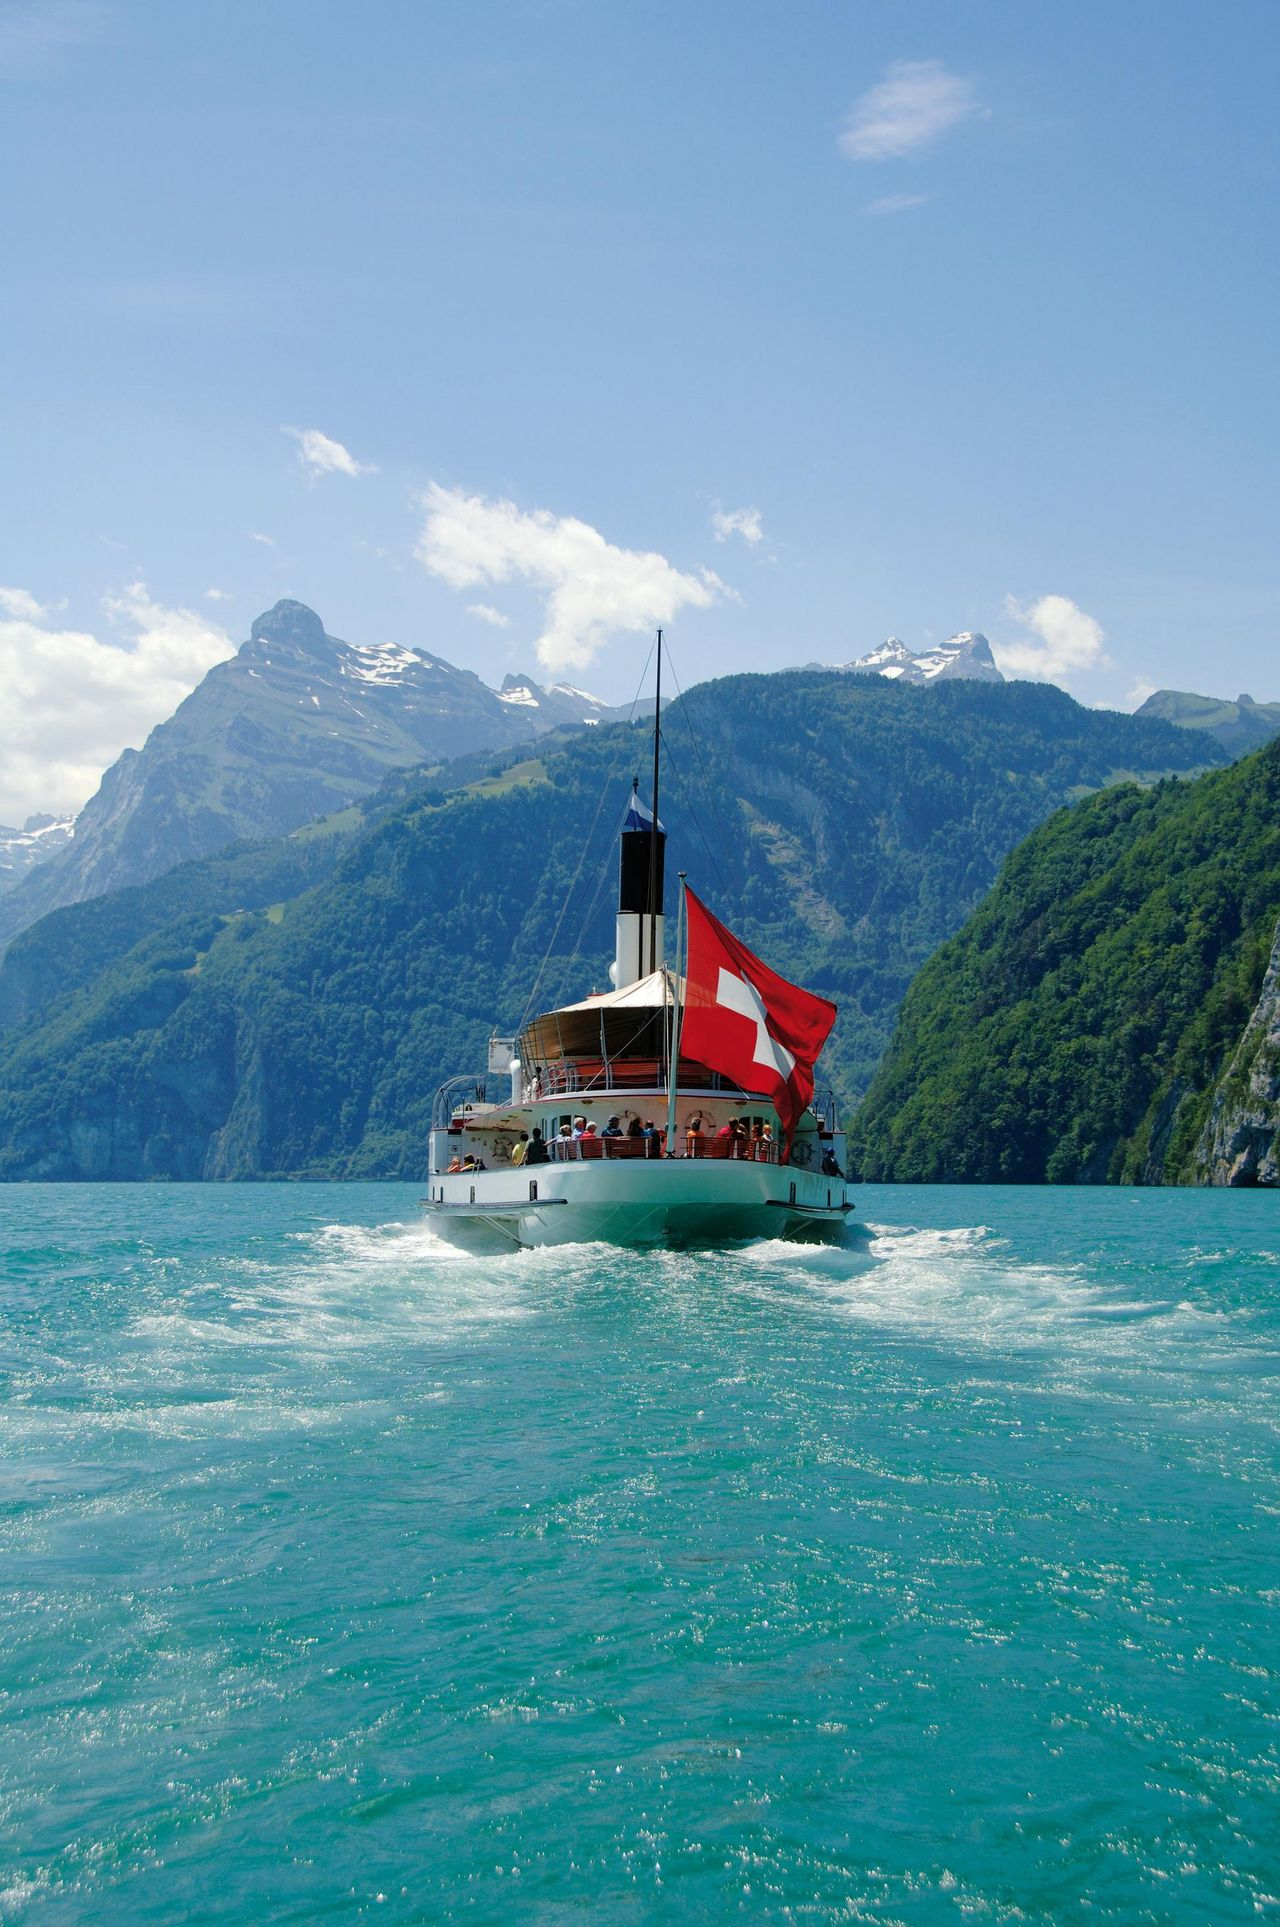 Lake Lucerne Navigation Company